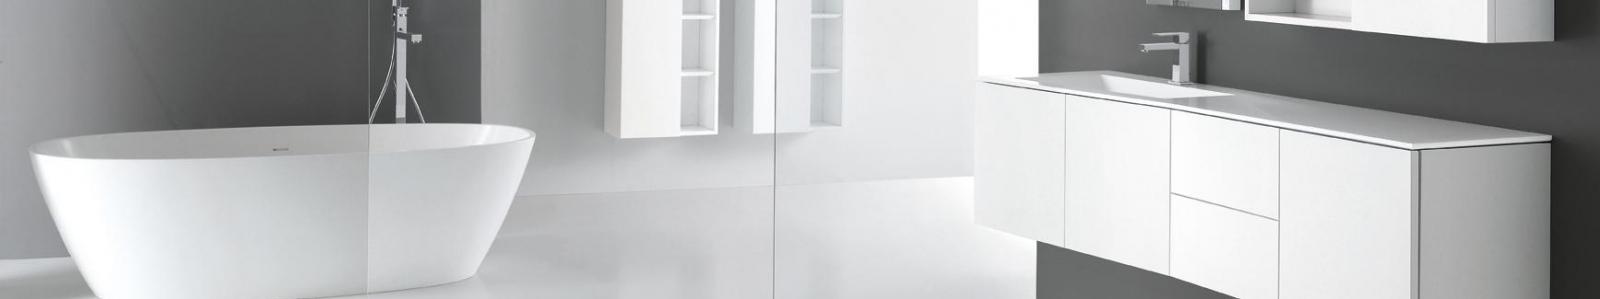 sanitair-1735x1303-7517d83c1_h300_cropped_1.jpg